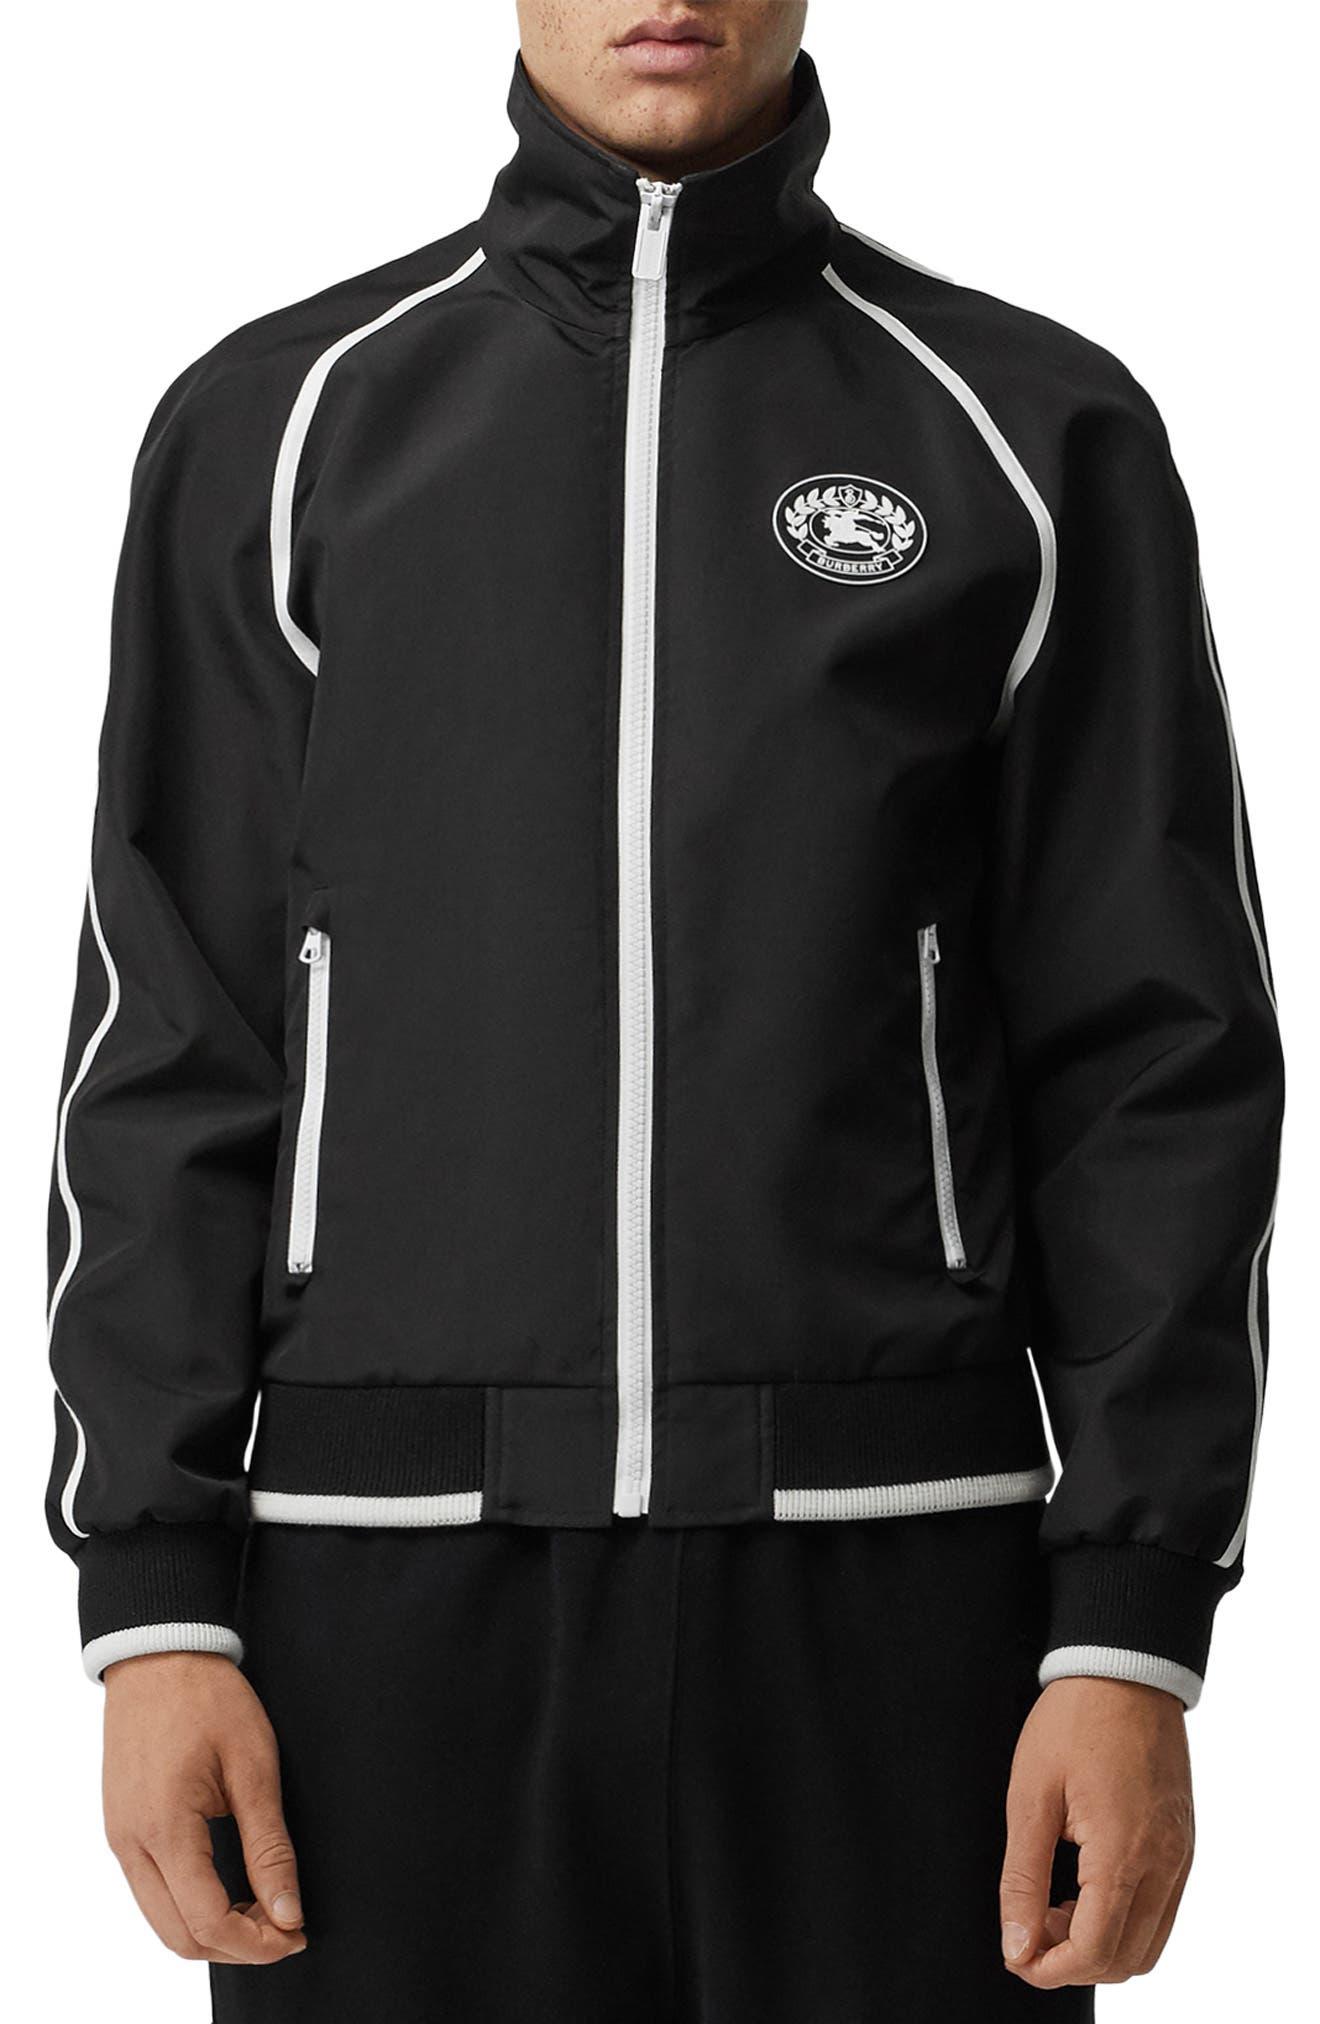 BURBERRY, Northfield Nylon Track Jacket, Main thumbnail 1, color, BLACK